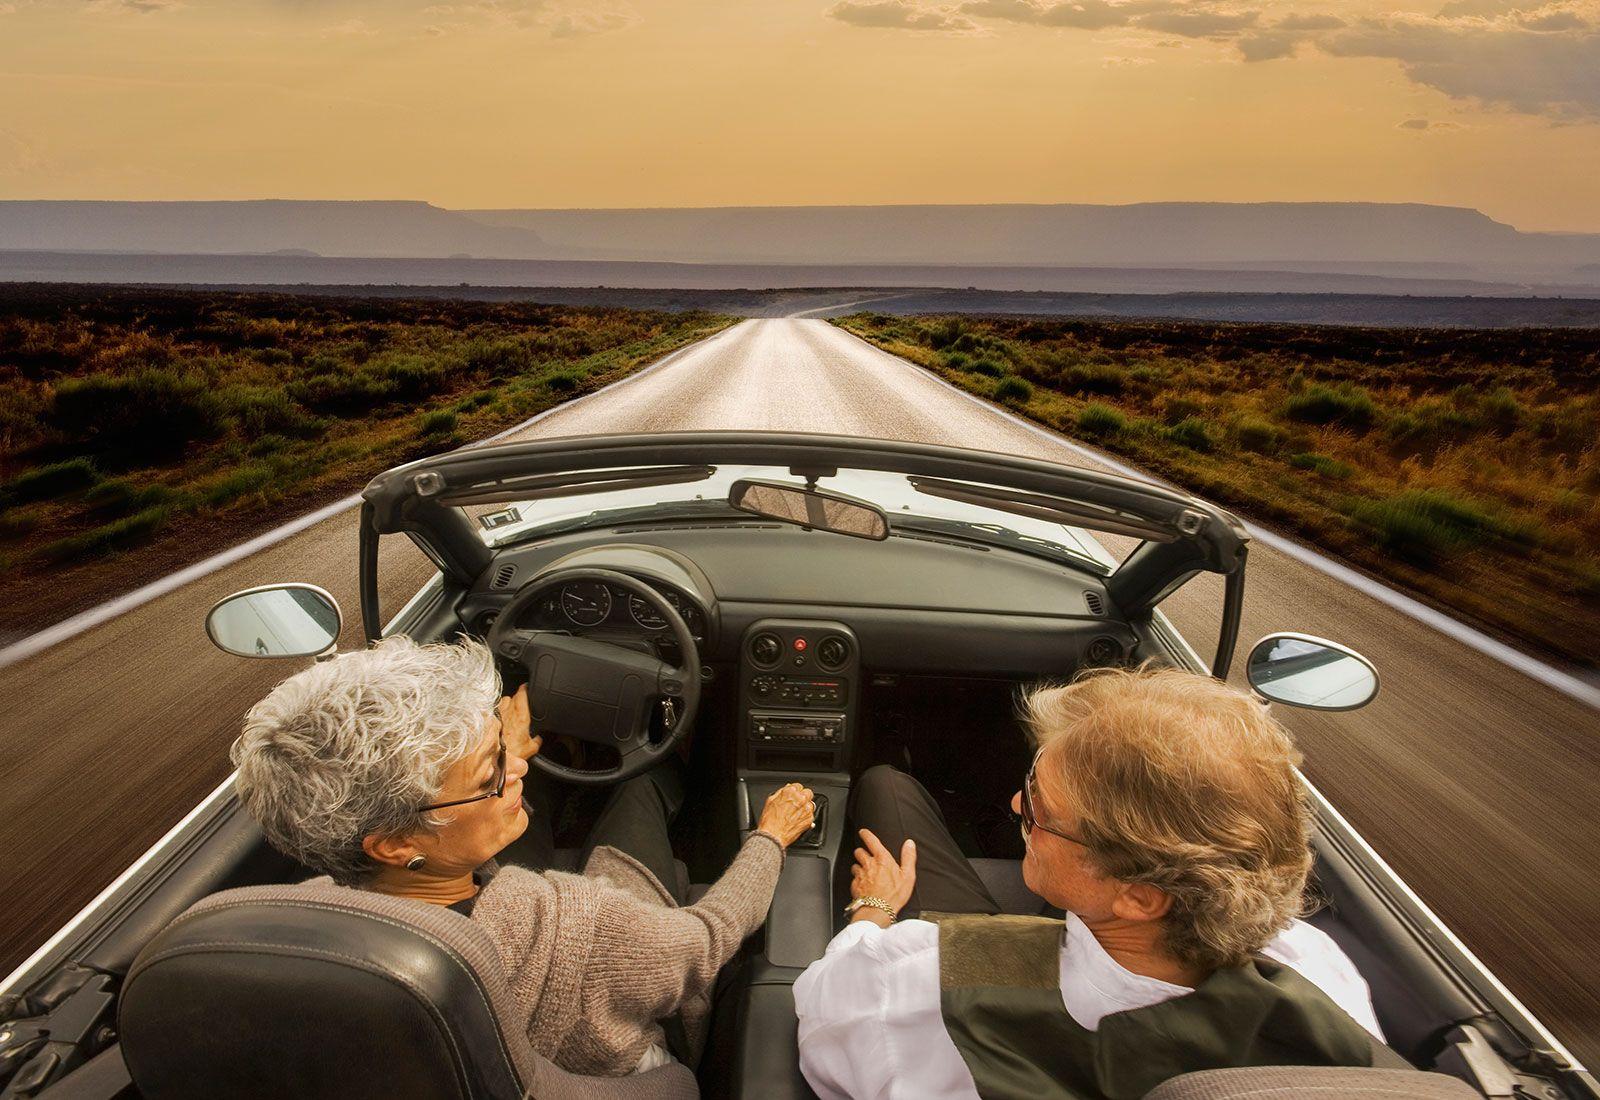 Elderly couple driving a convertible car